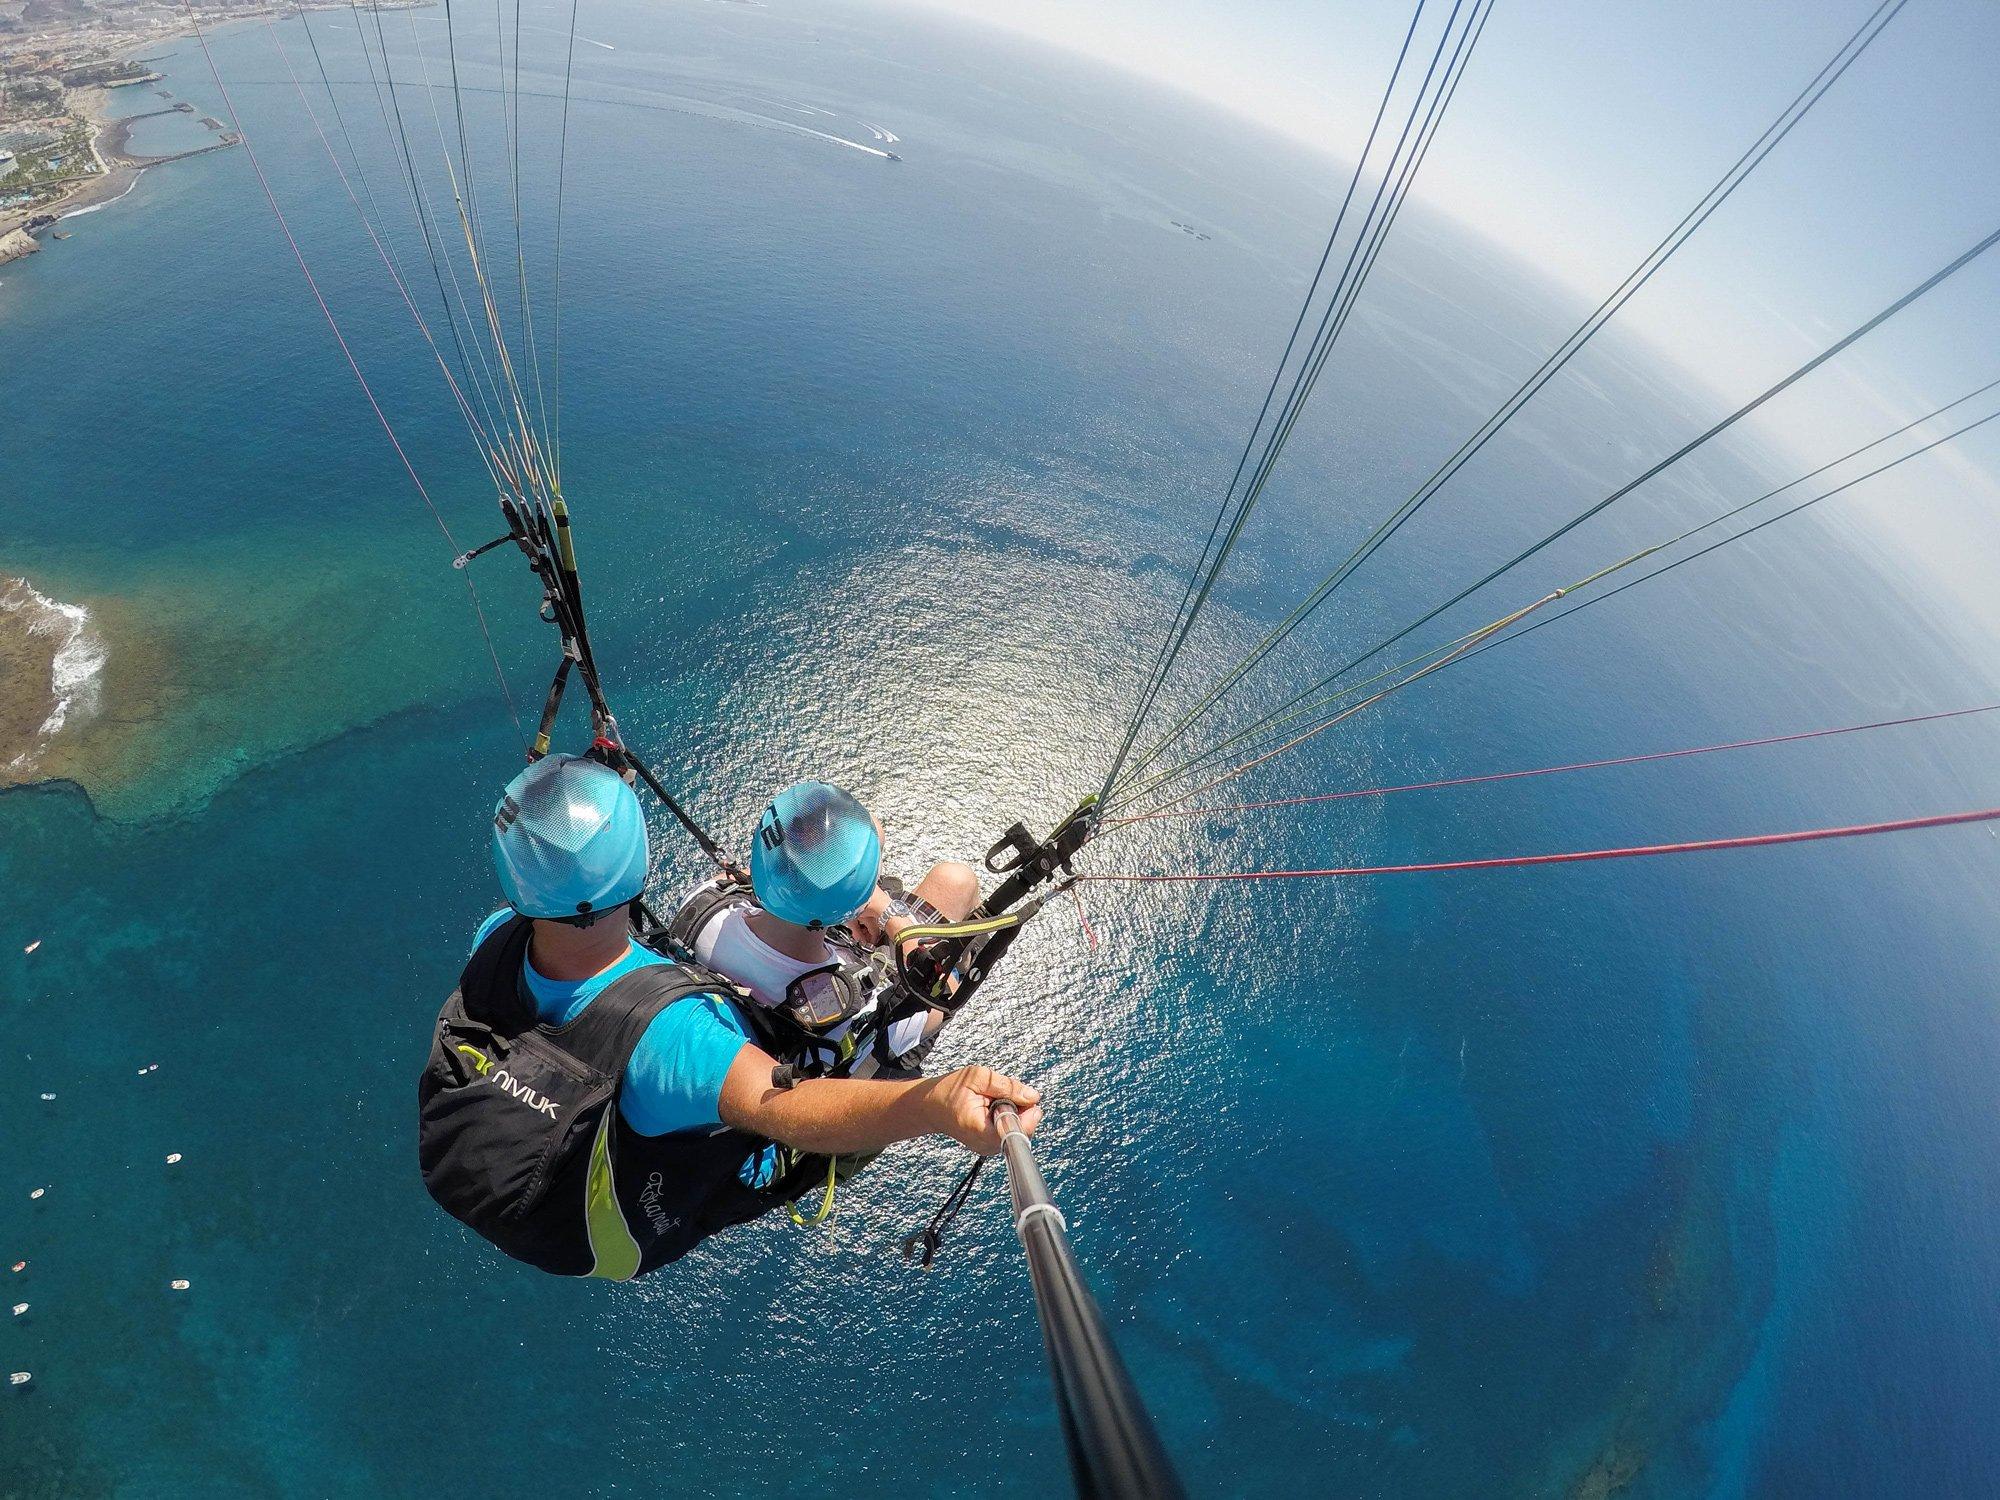 paragliding information